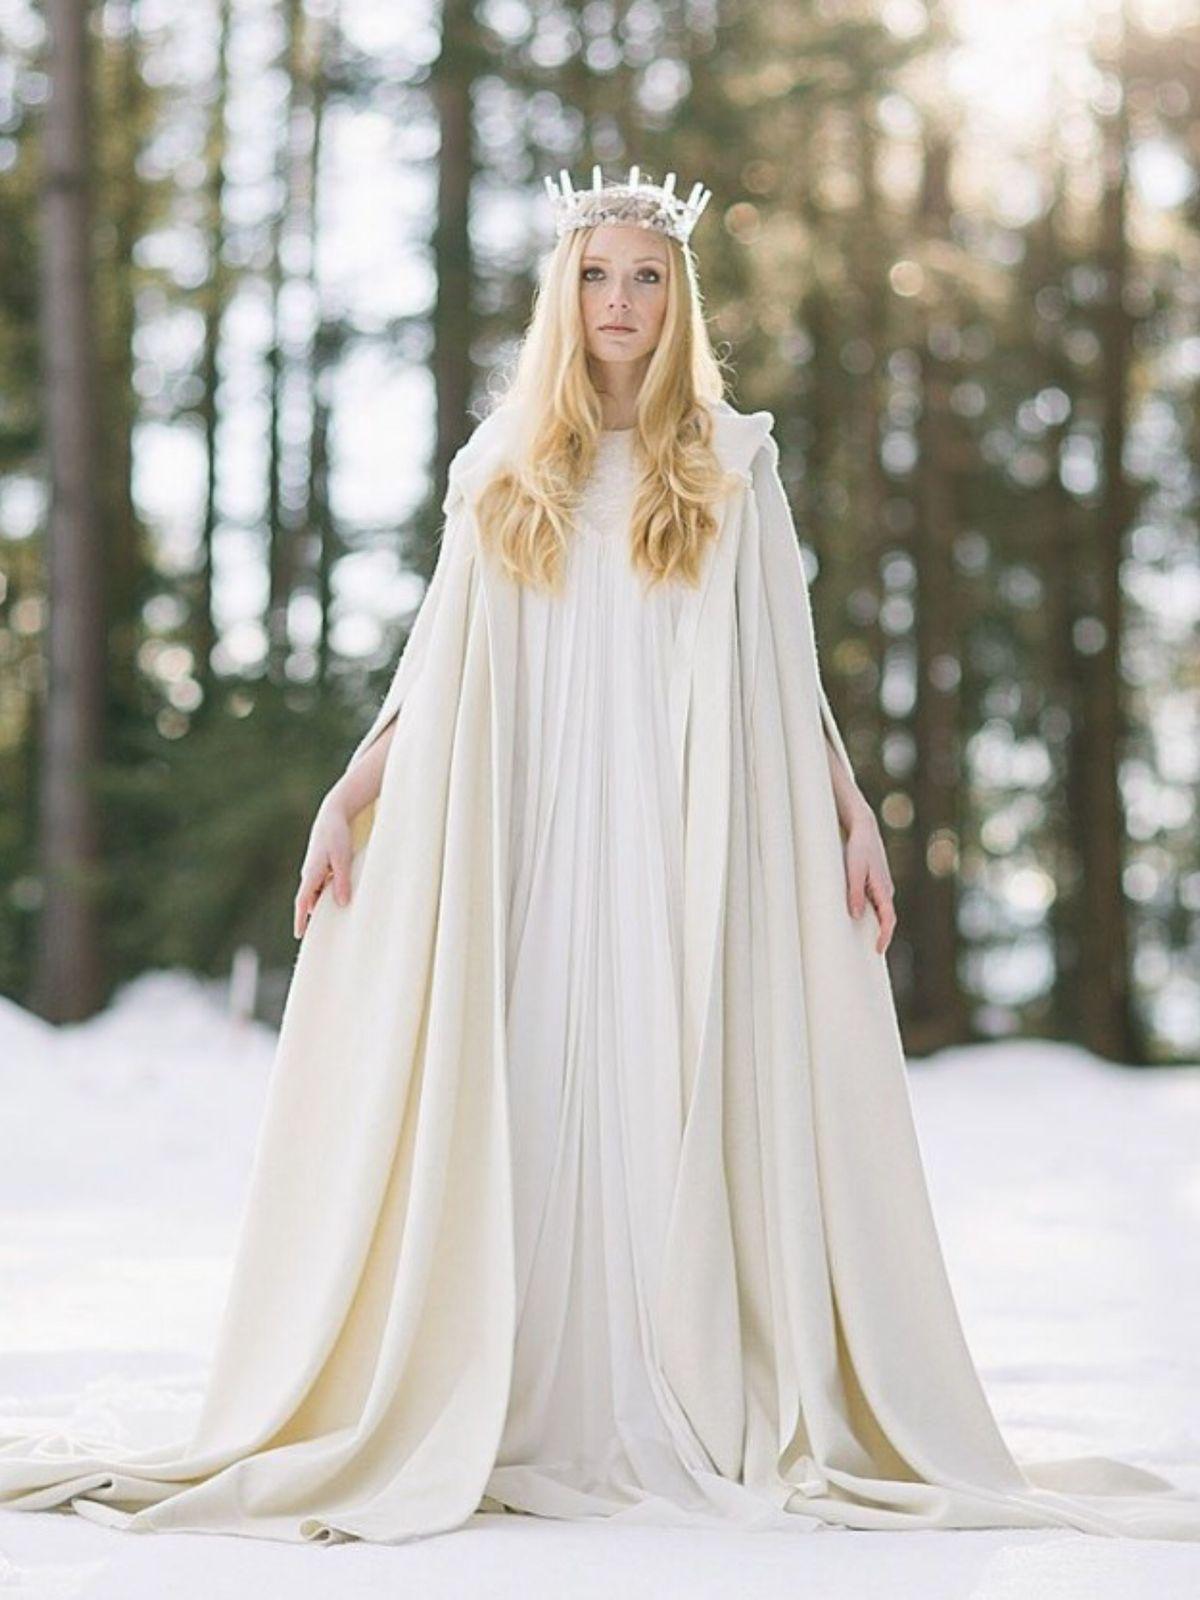 Winter Wedding cape 10 best photos | Winter wedding cape, Wedding ...